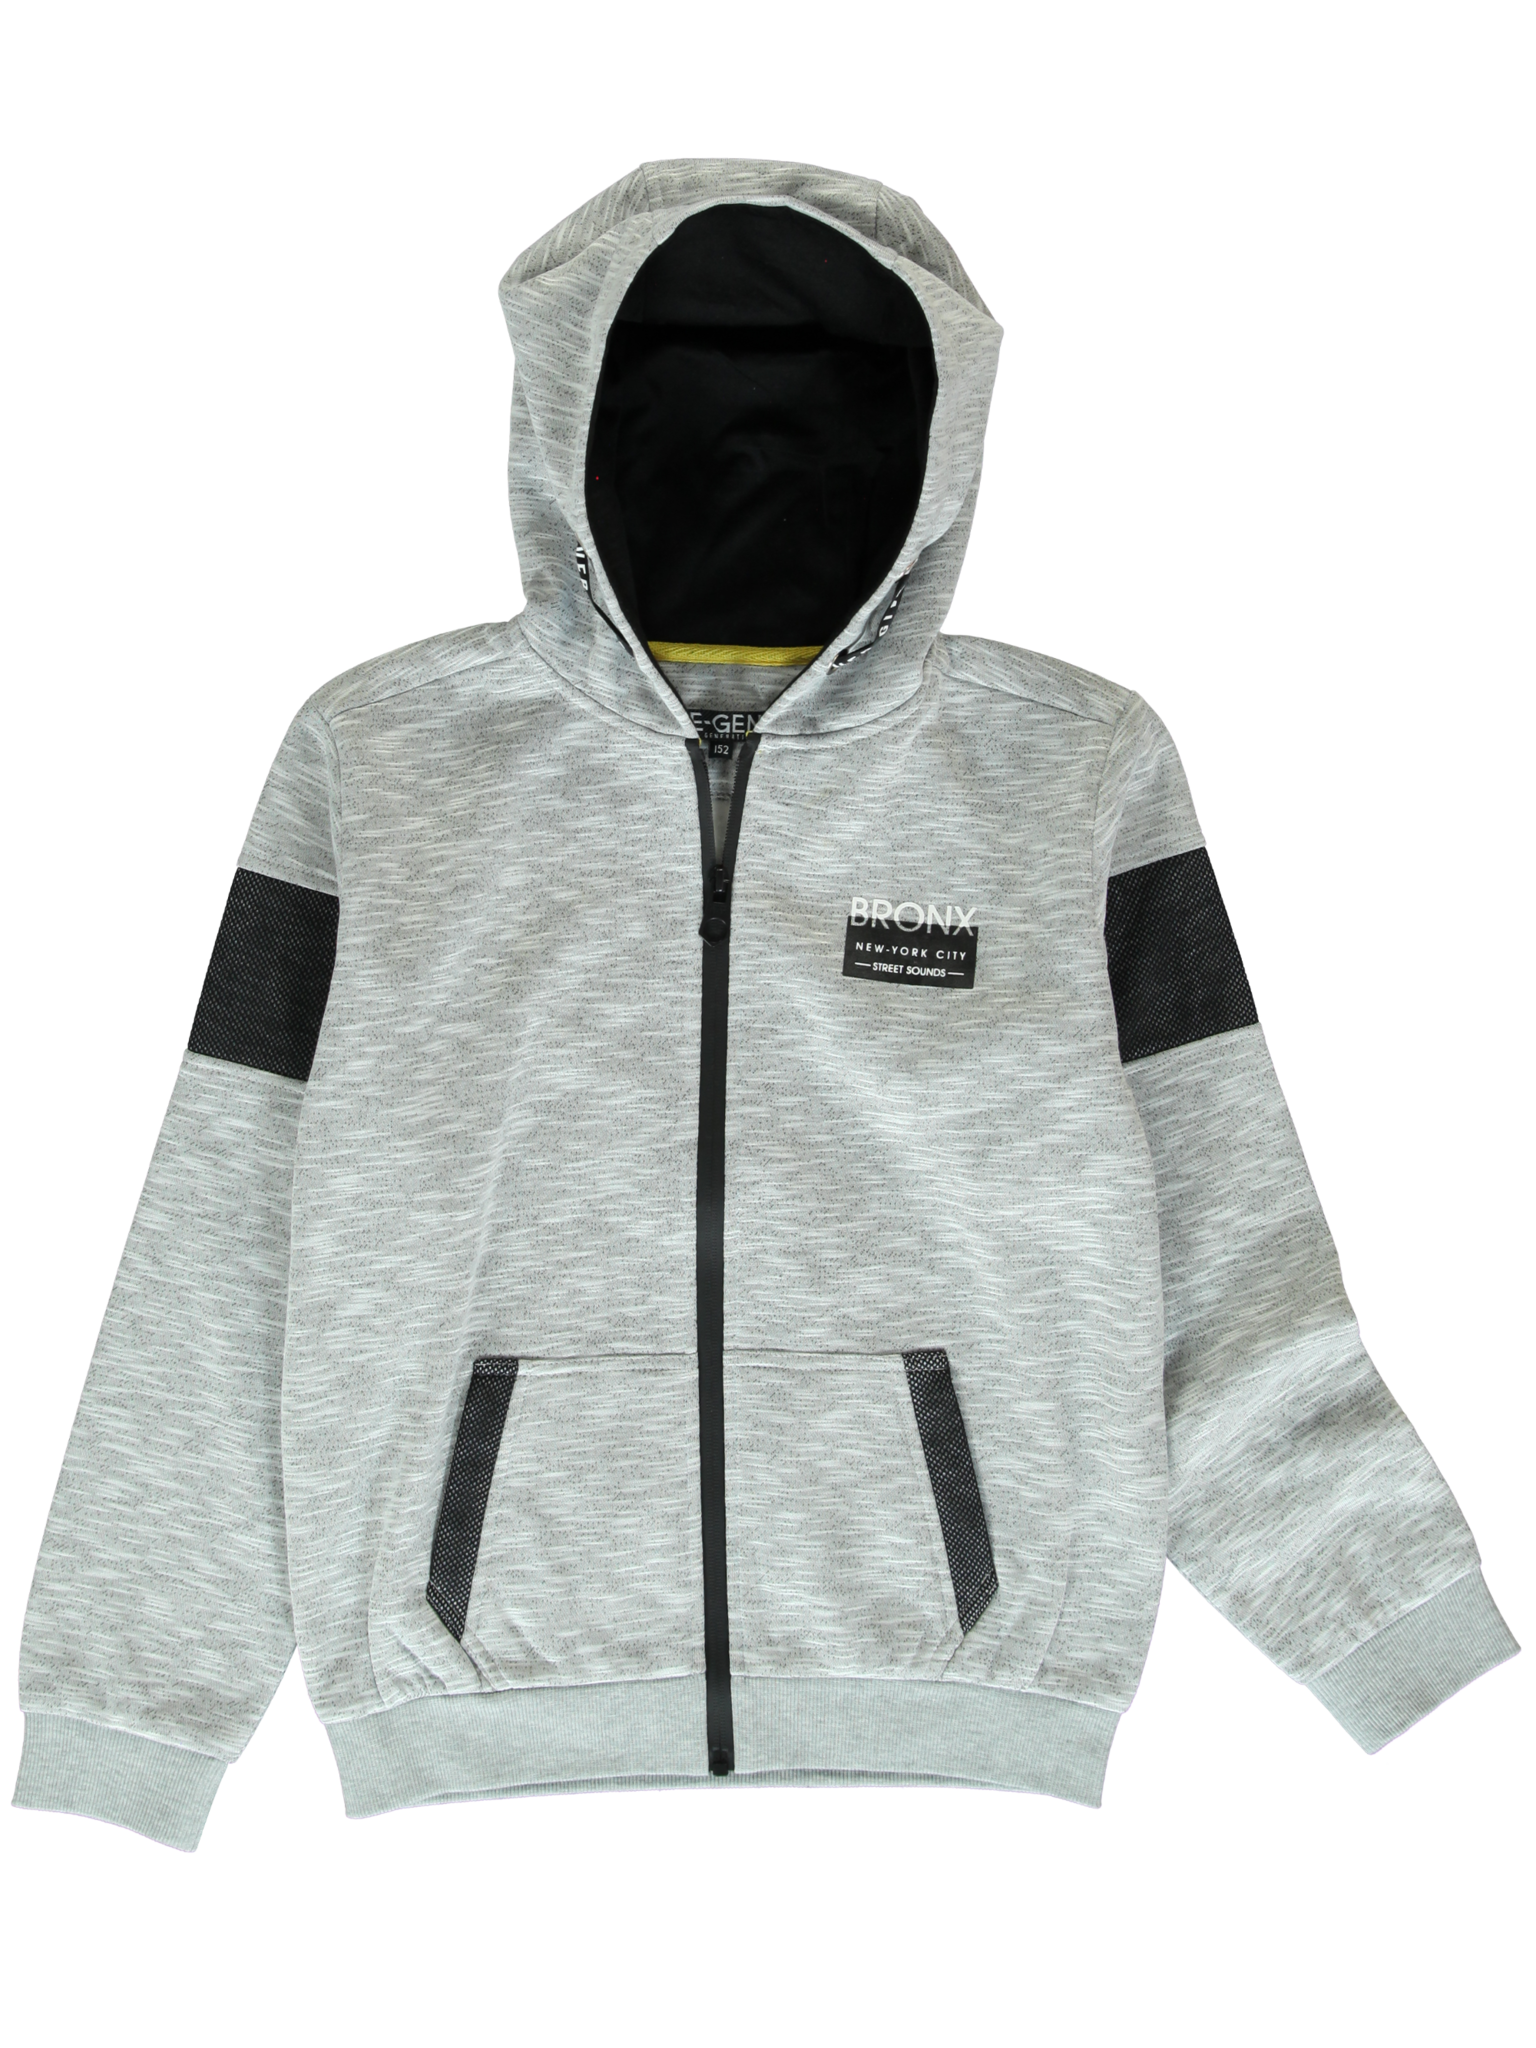 All Brands | Winterproducts Teen Boys | Cardigan Sweater | 20 pcs/box